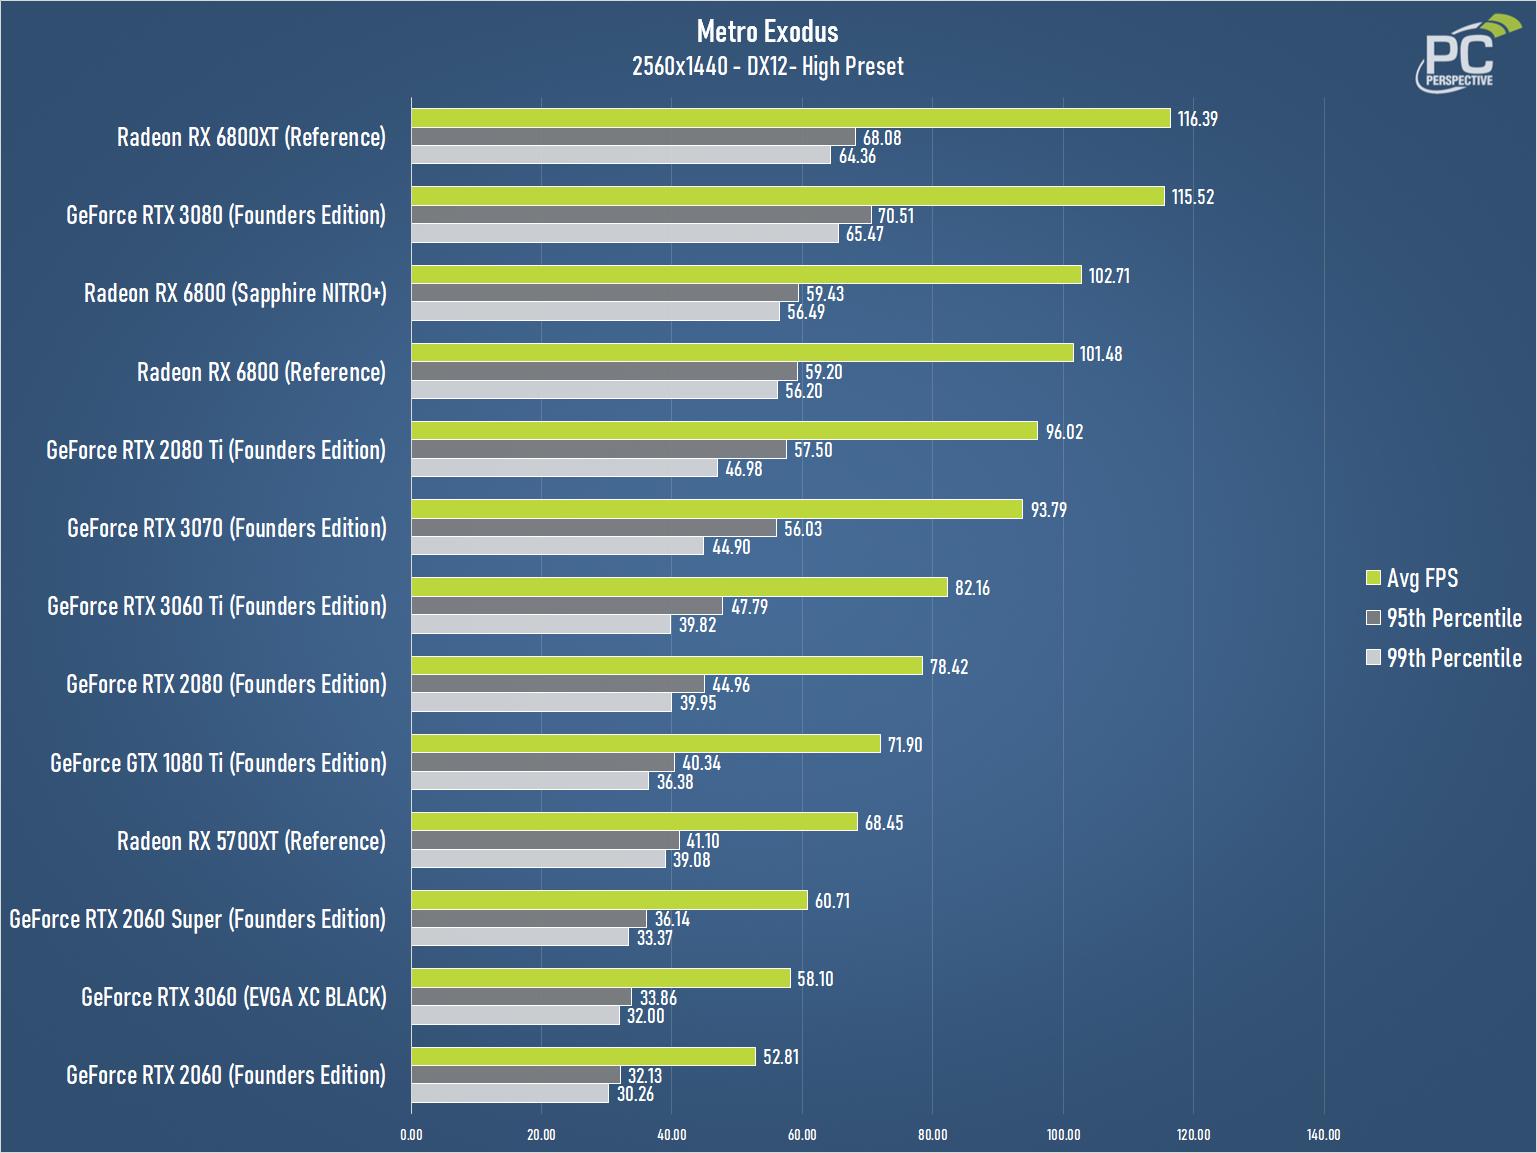 GeForce RTX 3060 EVGA XC BLACK Metro Exodus 1440 Chart